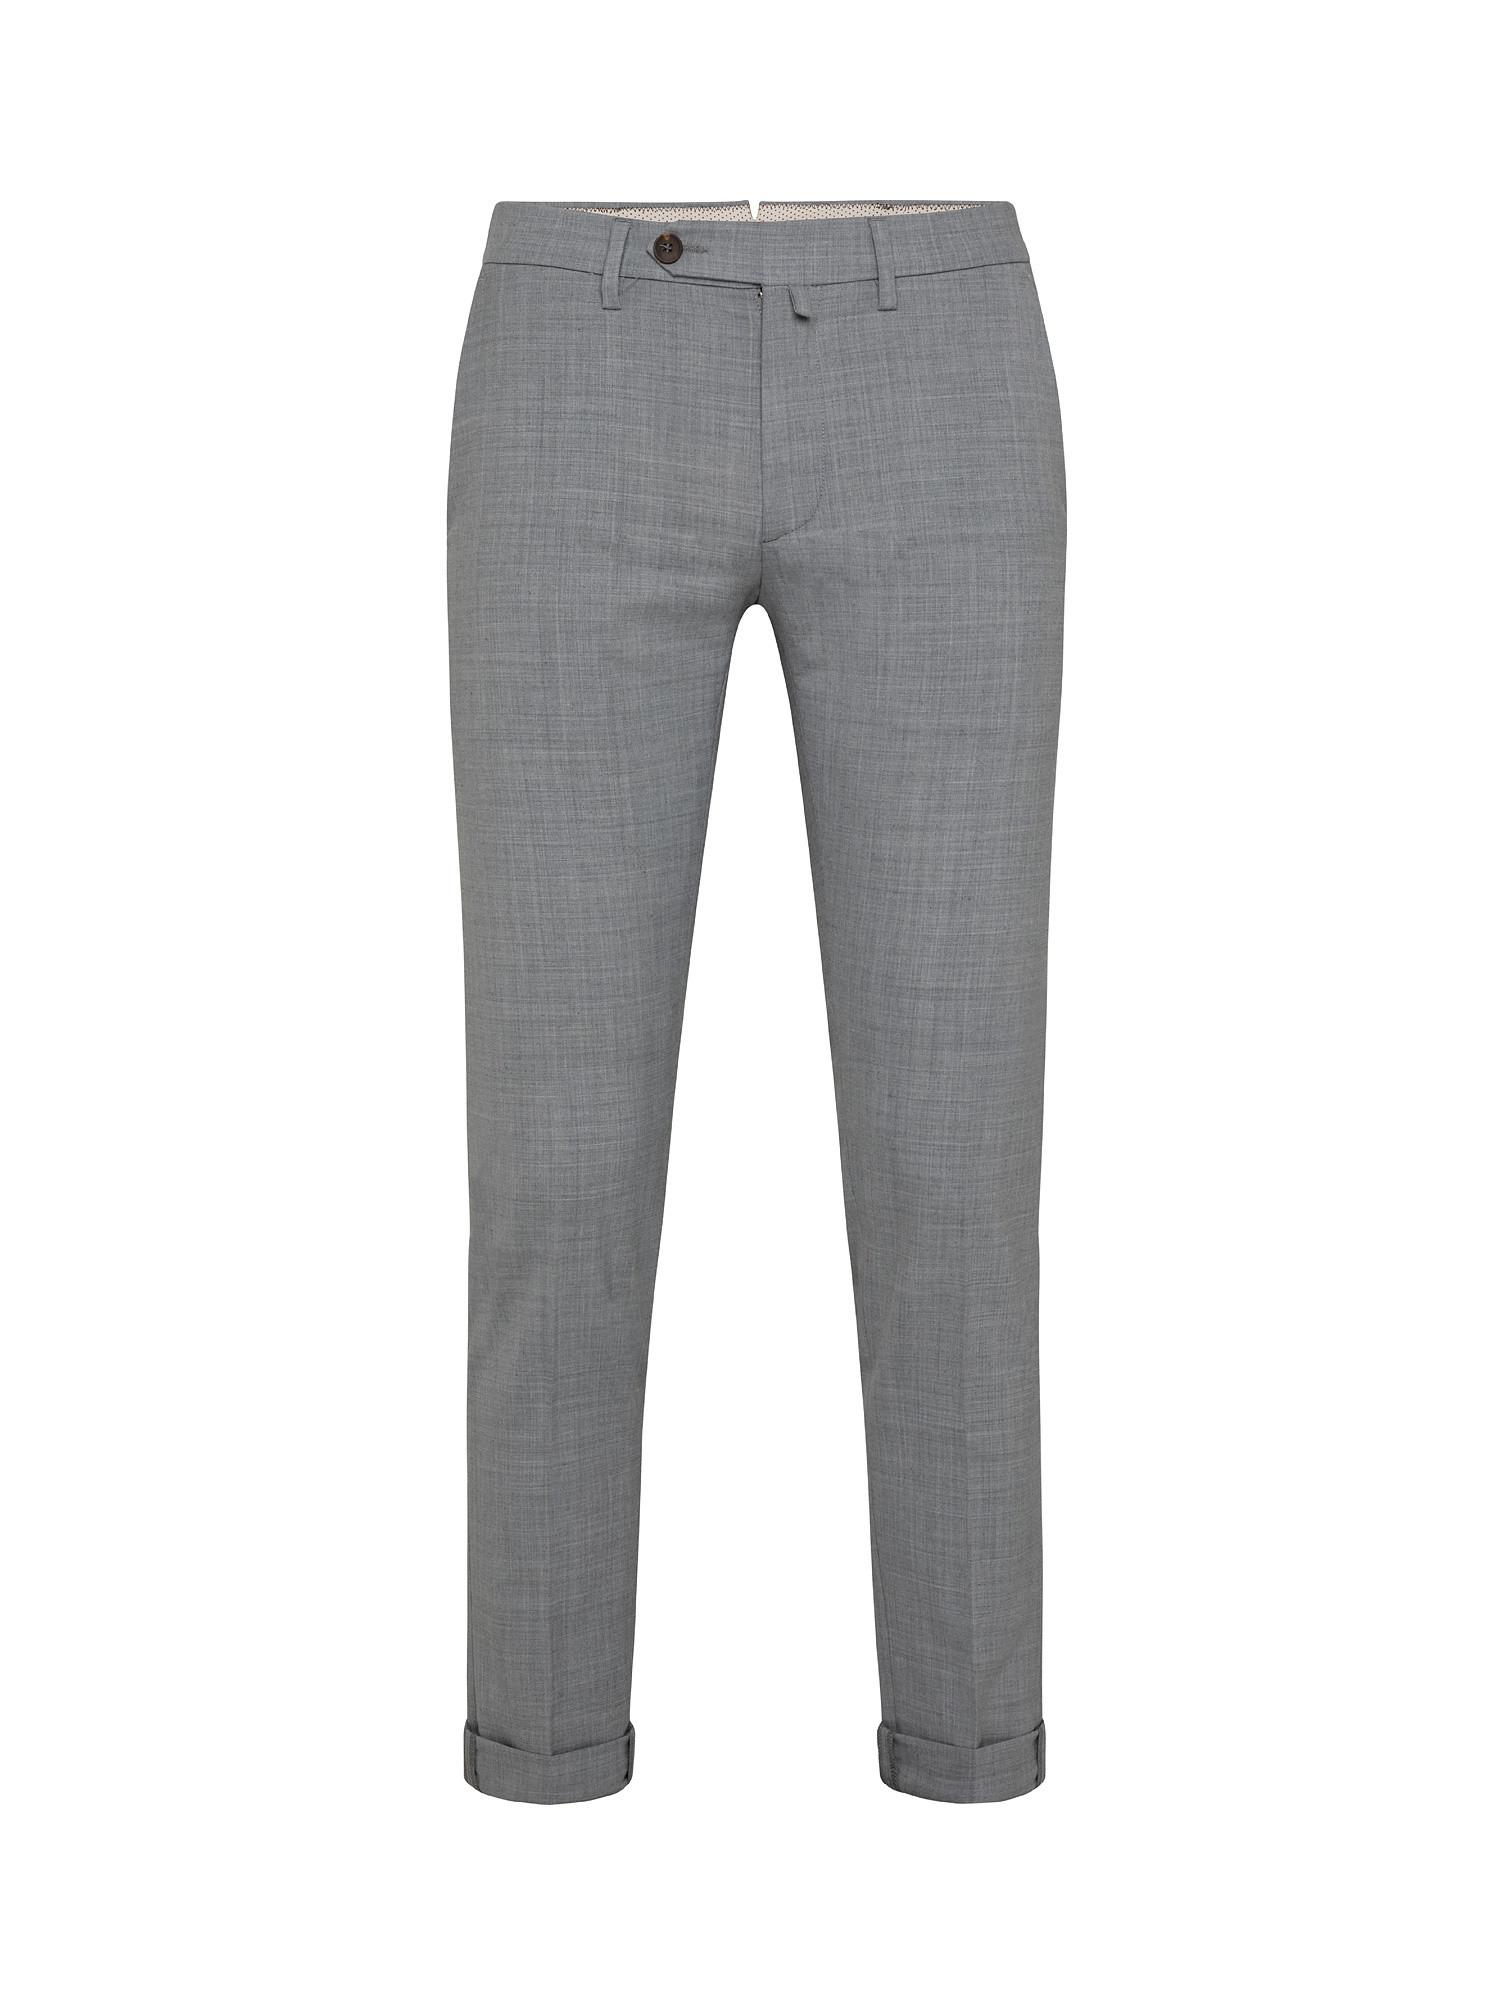 Pantalone chino misto lana, Grigio, large image number 0